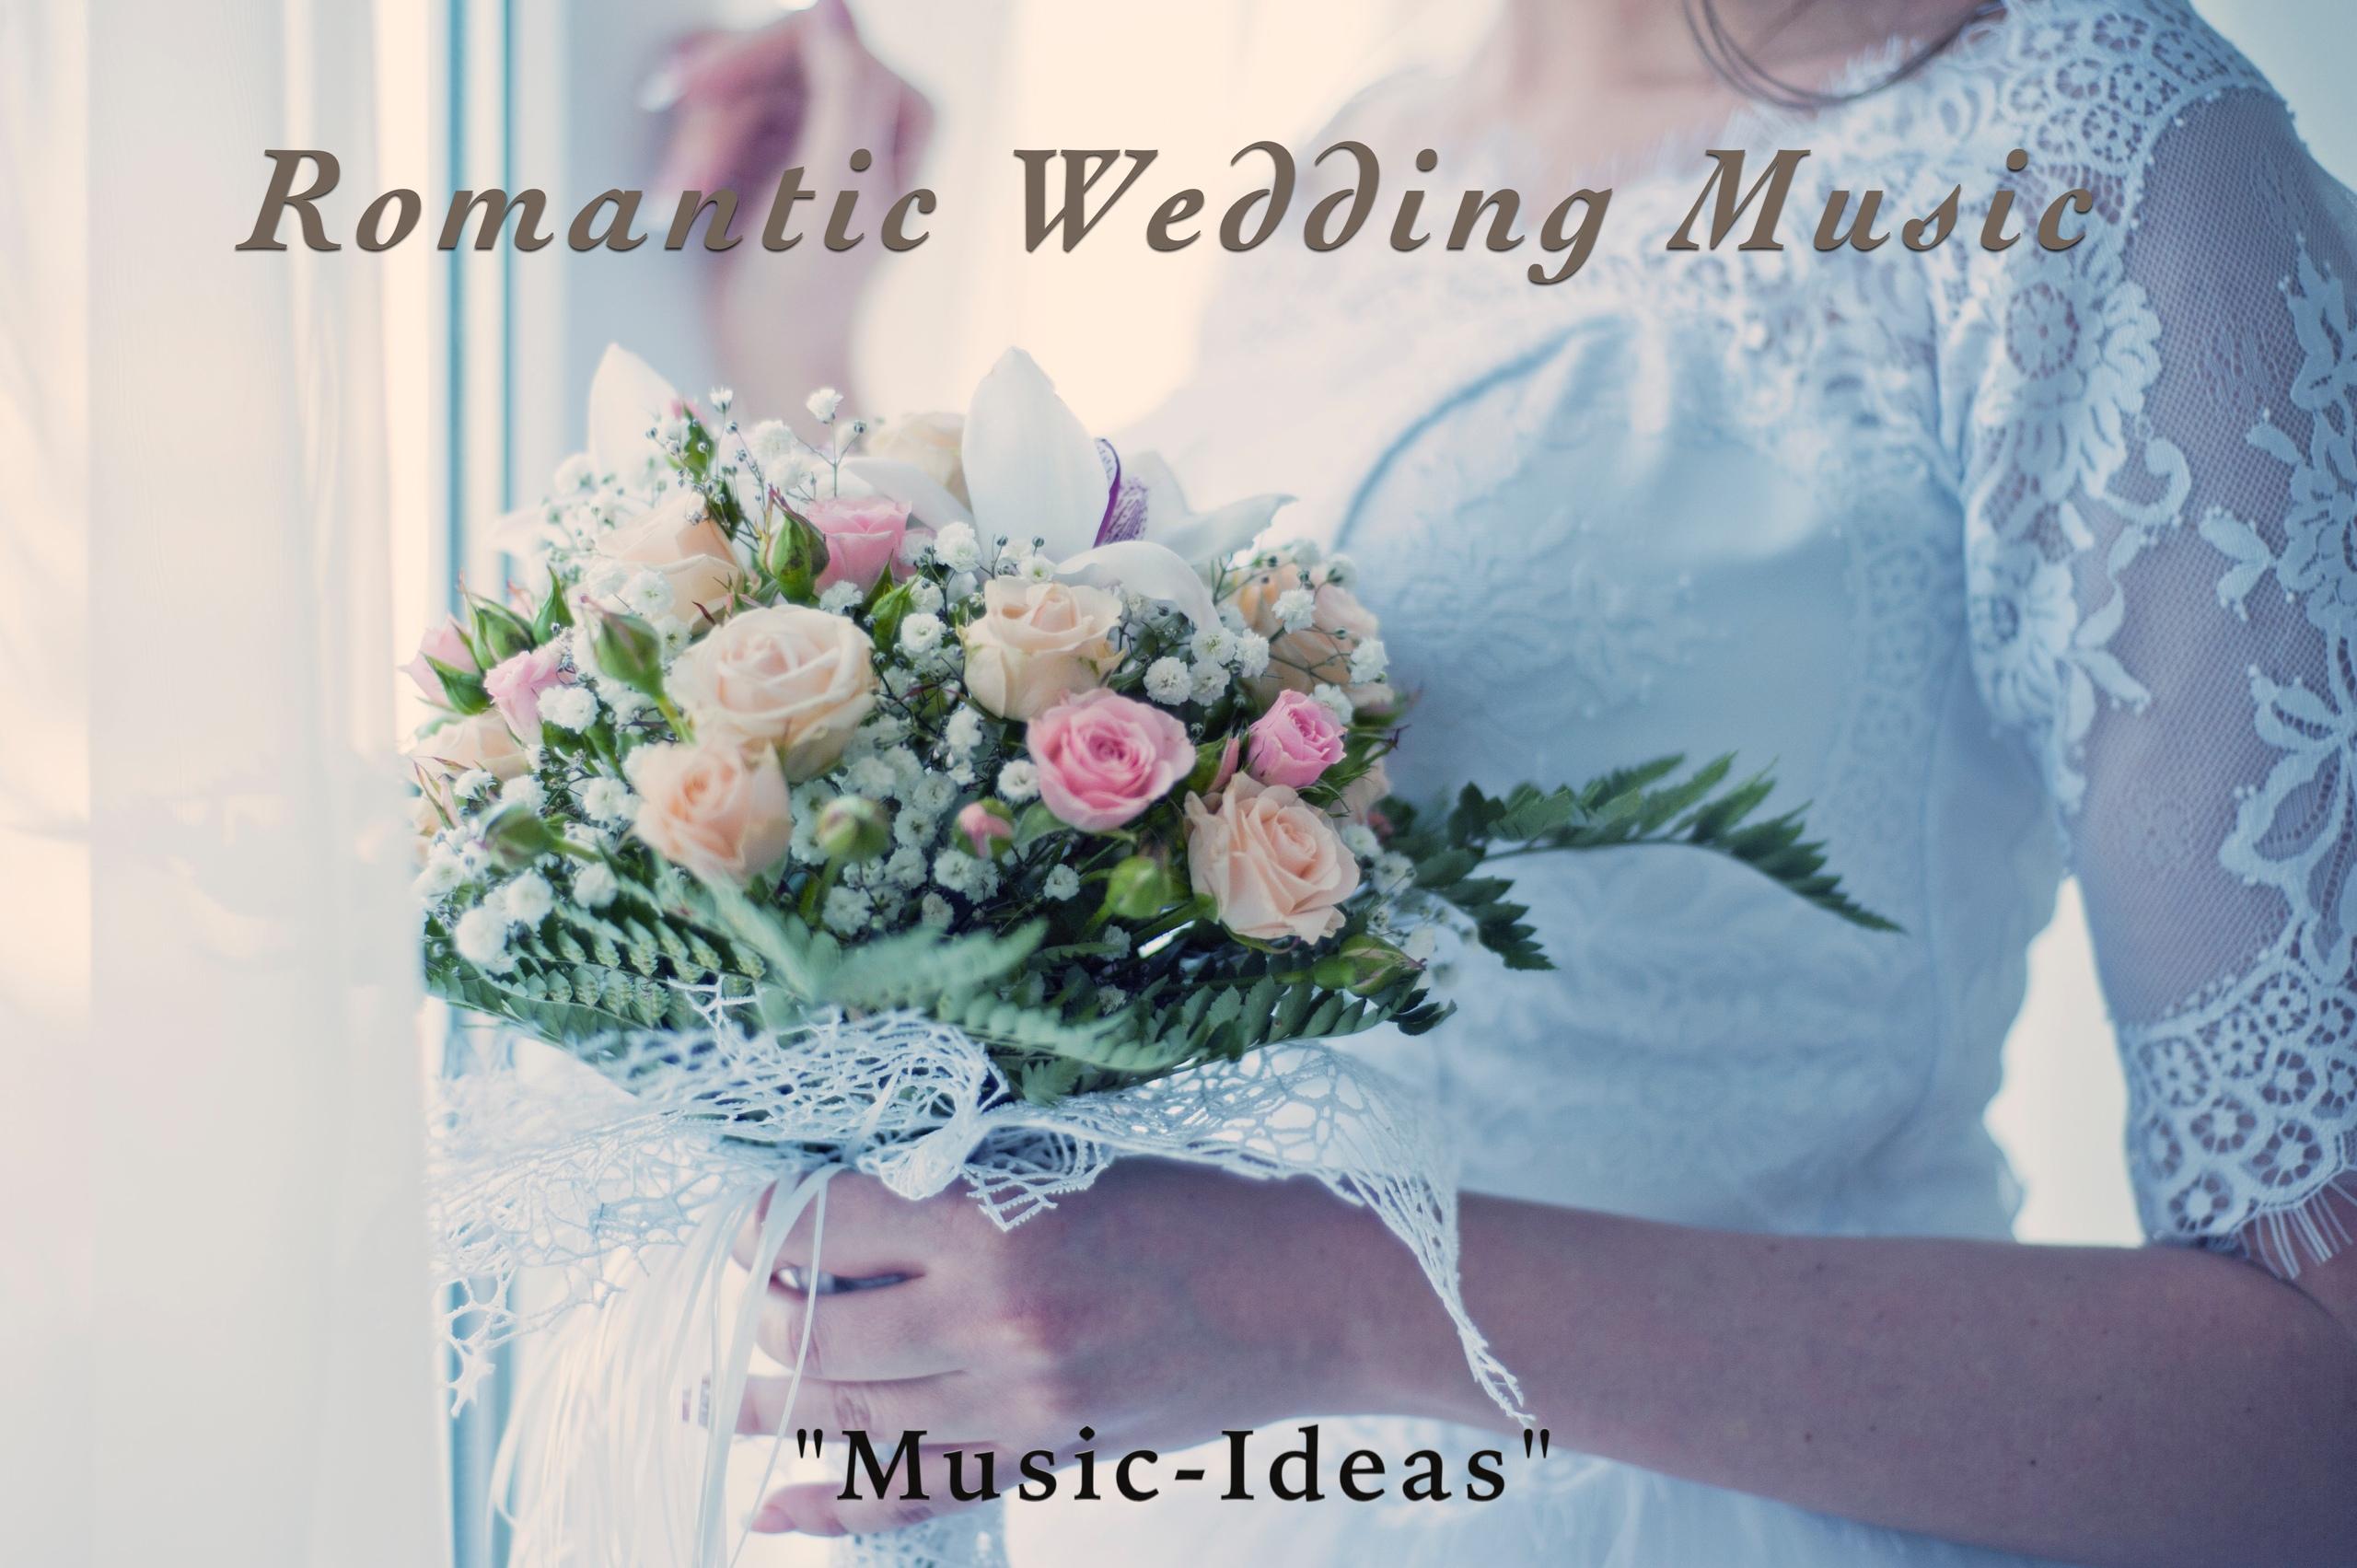 Romantic Wedding Music Kit - 1